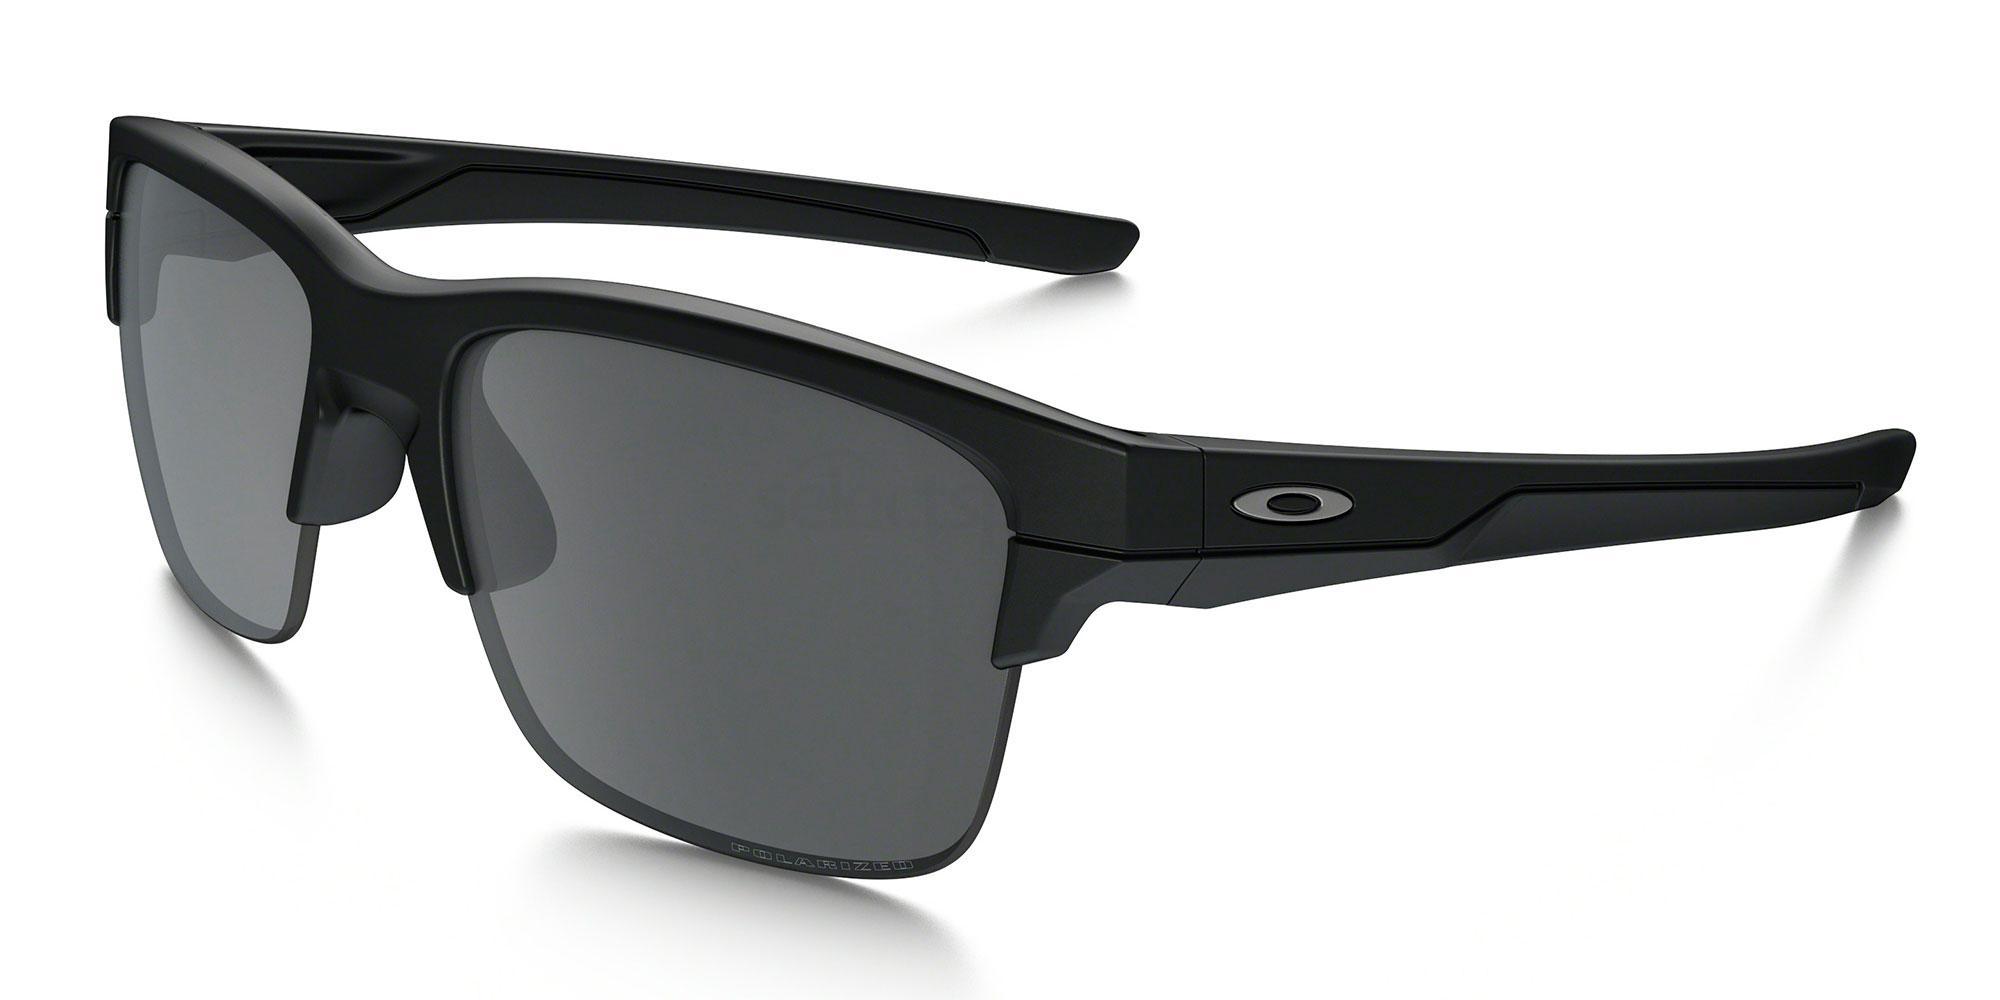 931606 OO9316 THINLINK POLARIZED Sunglasses, Oakley